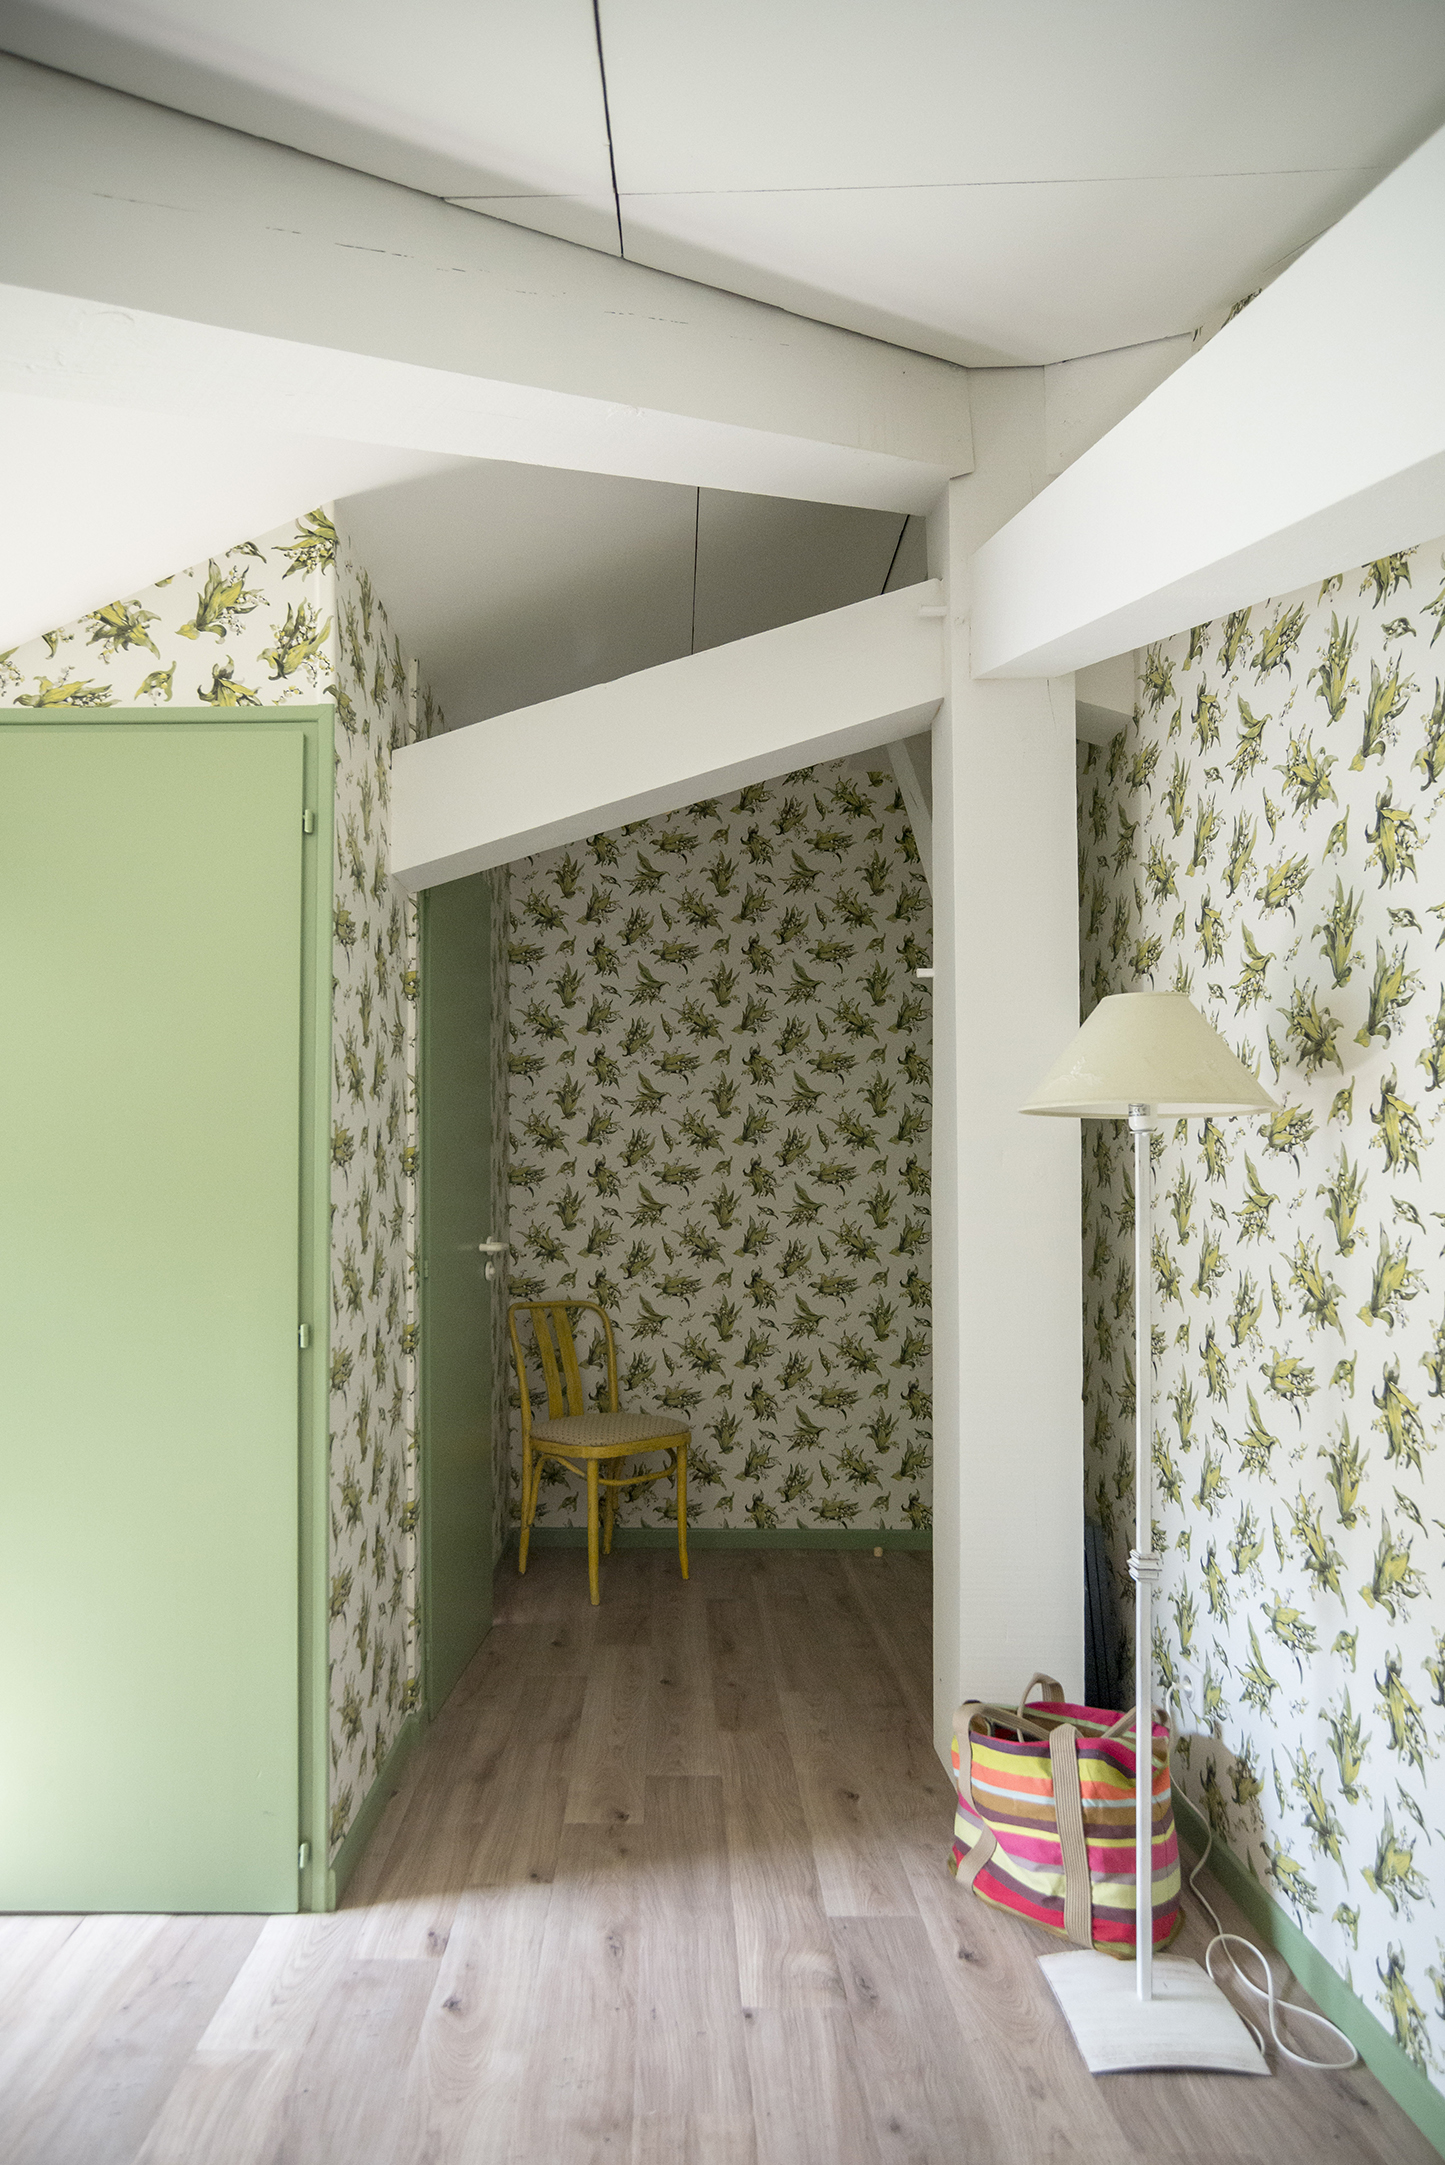 Lala Architectes_Landes_Rénovation_Chambre_Vert_Combles aménagés